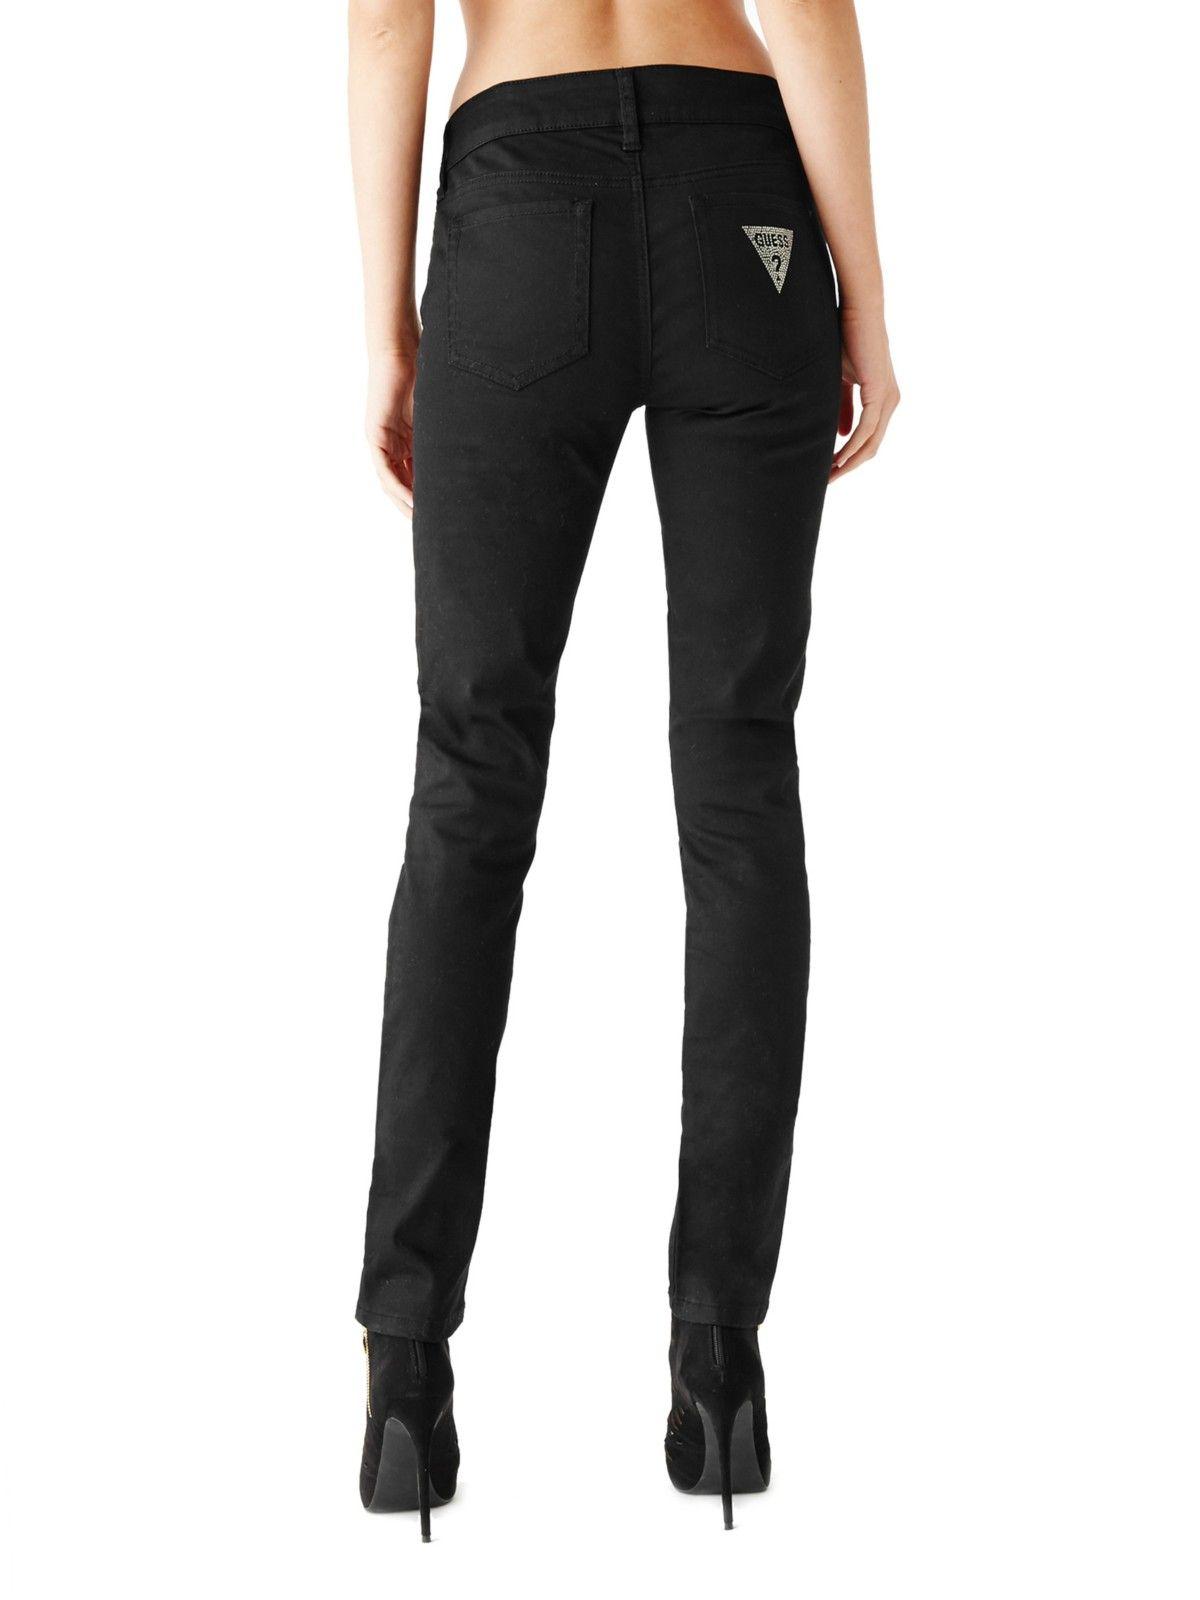 Karlia Logo Skinny Jeans in Black Wash | Products | Jeans